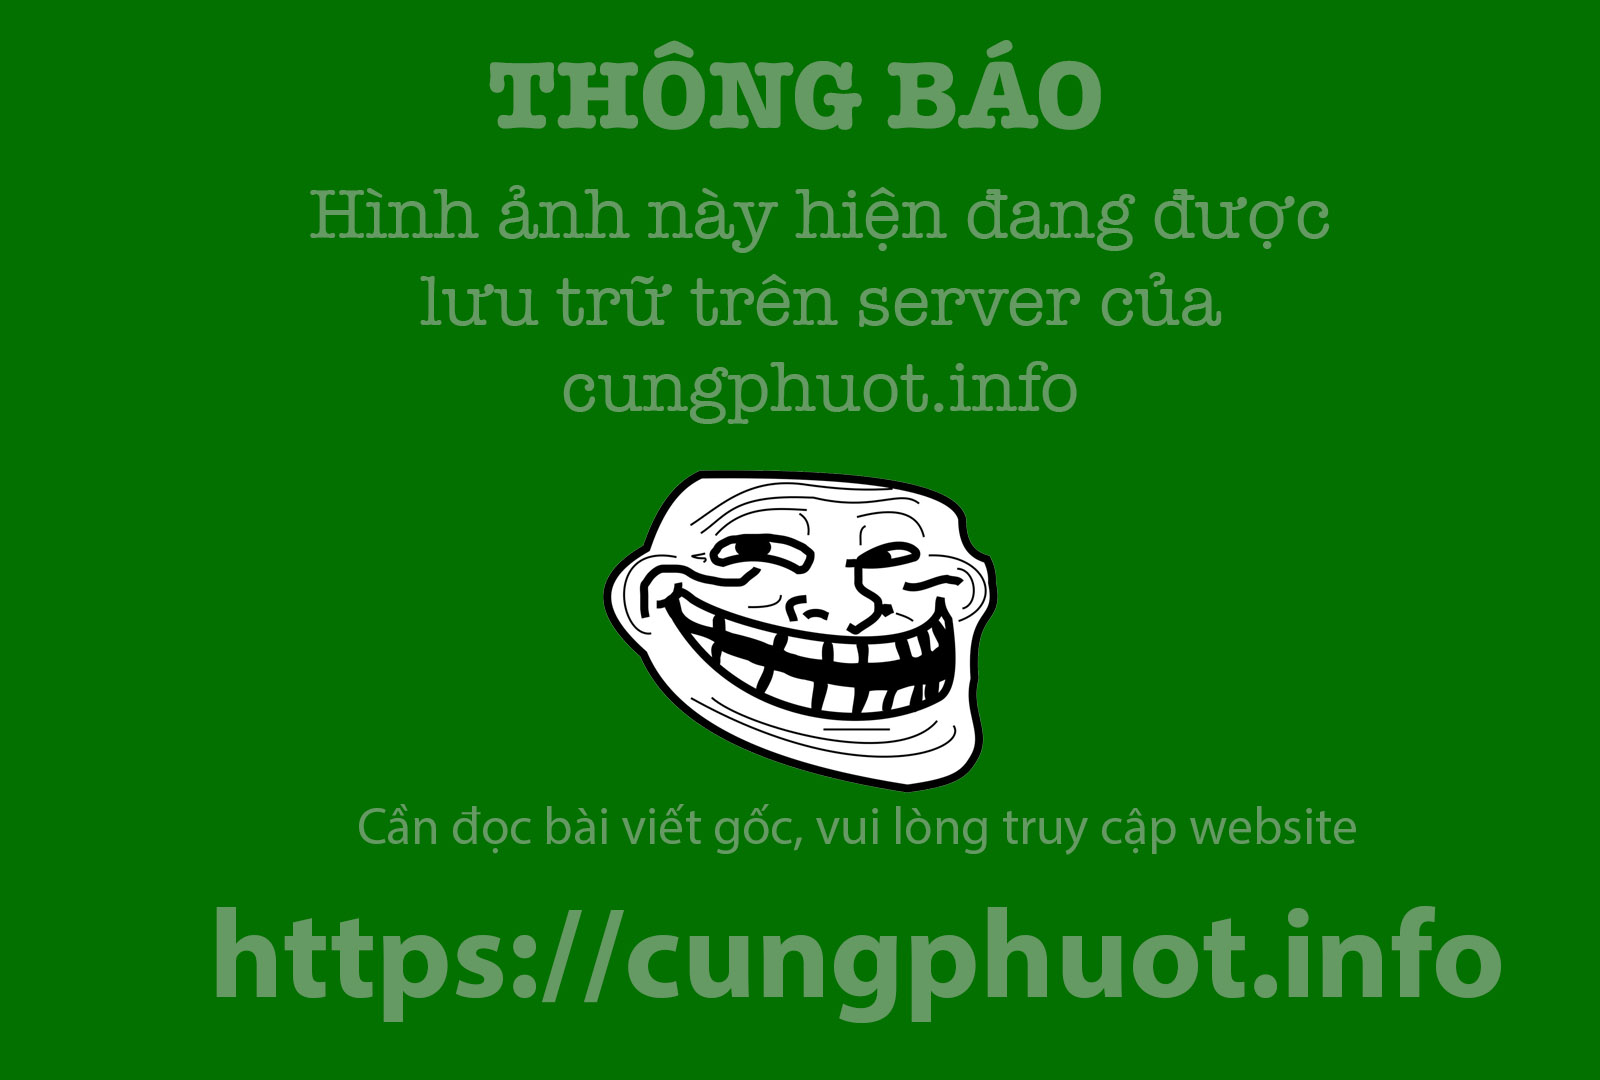 Vuon hoa tam giac mach o Ninh Binh hinh anh 2